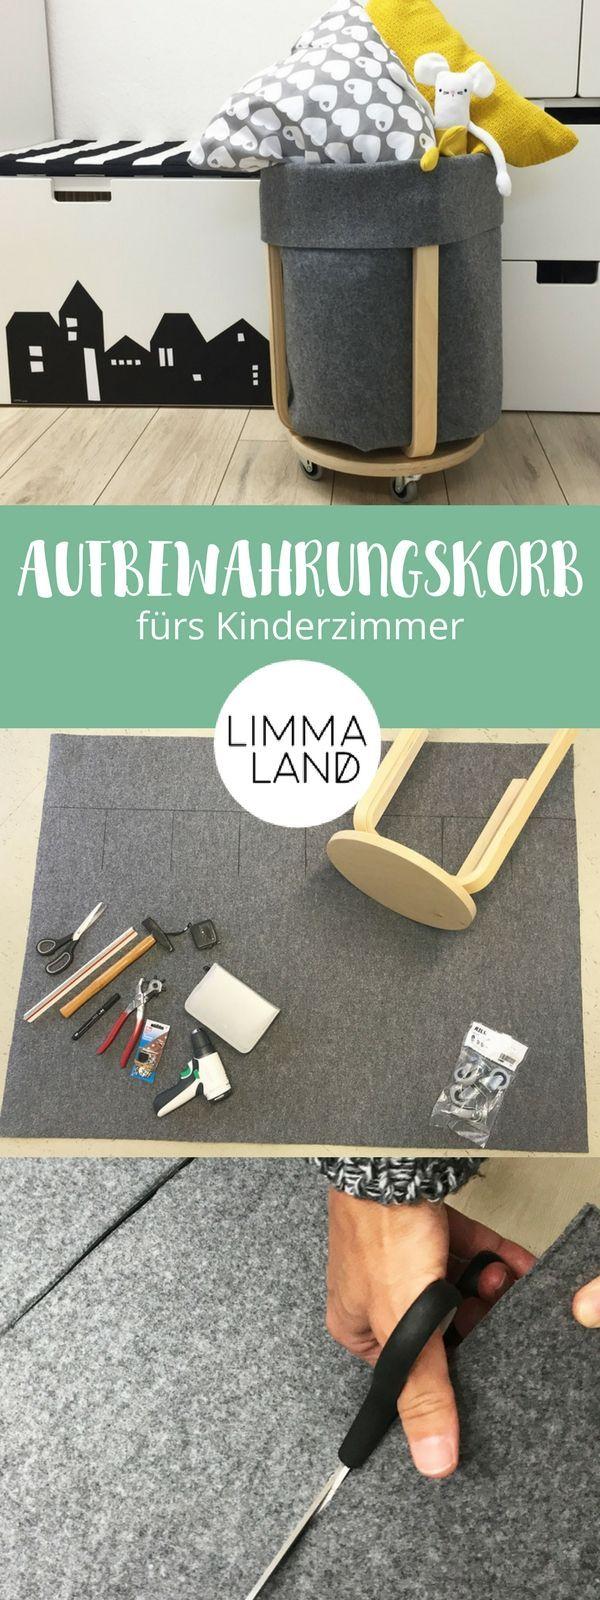 IKEA Hack: Filz Utensilo basteln statt nähen mit dem FROSTA Hocker ...